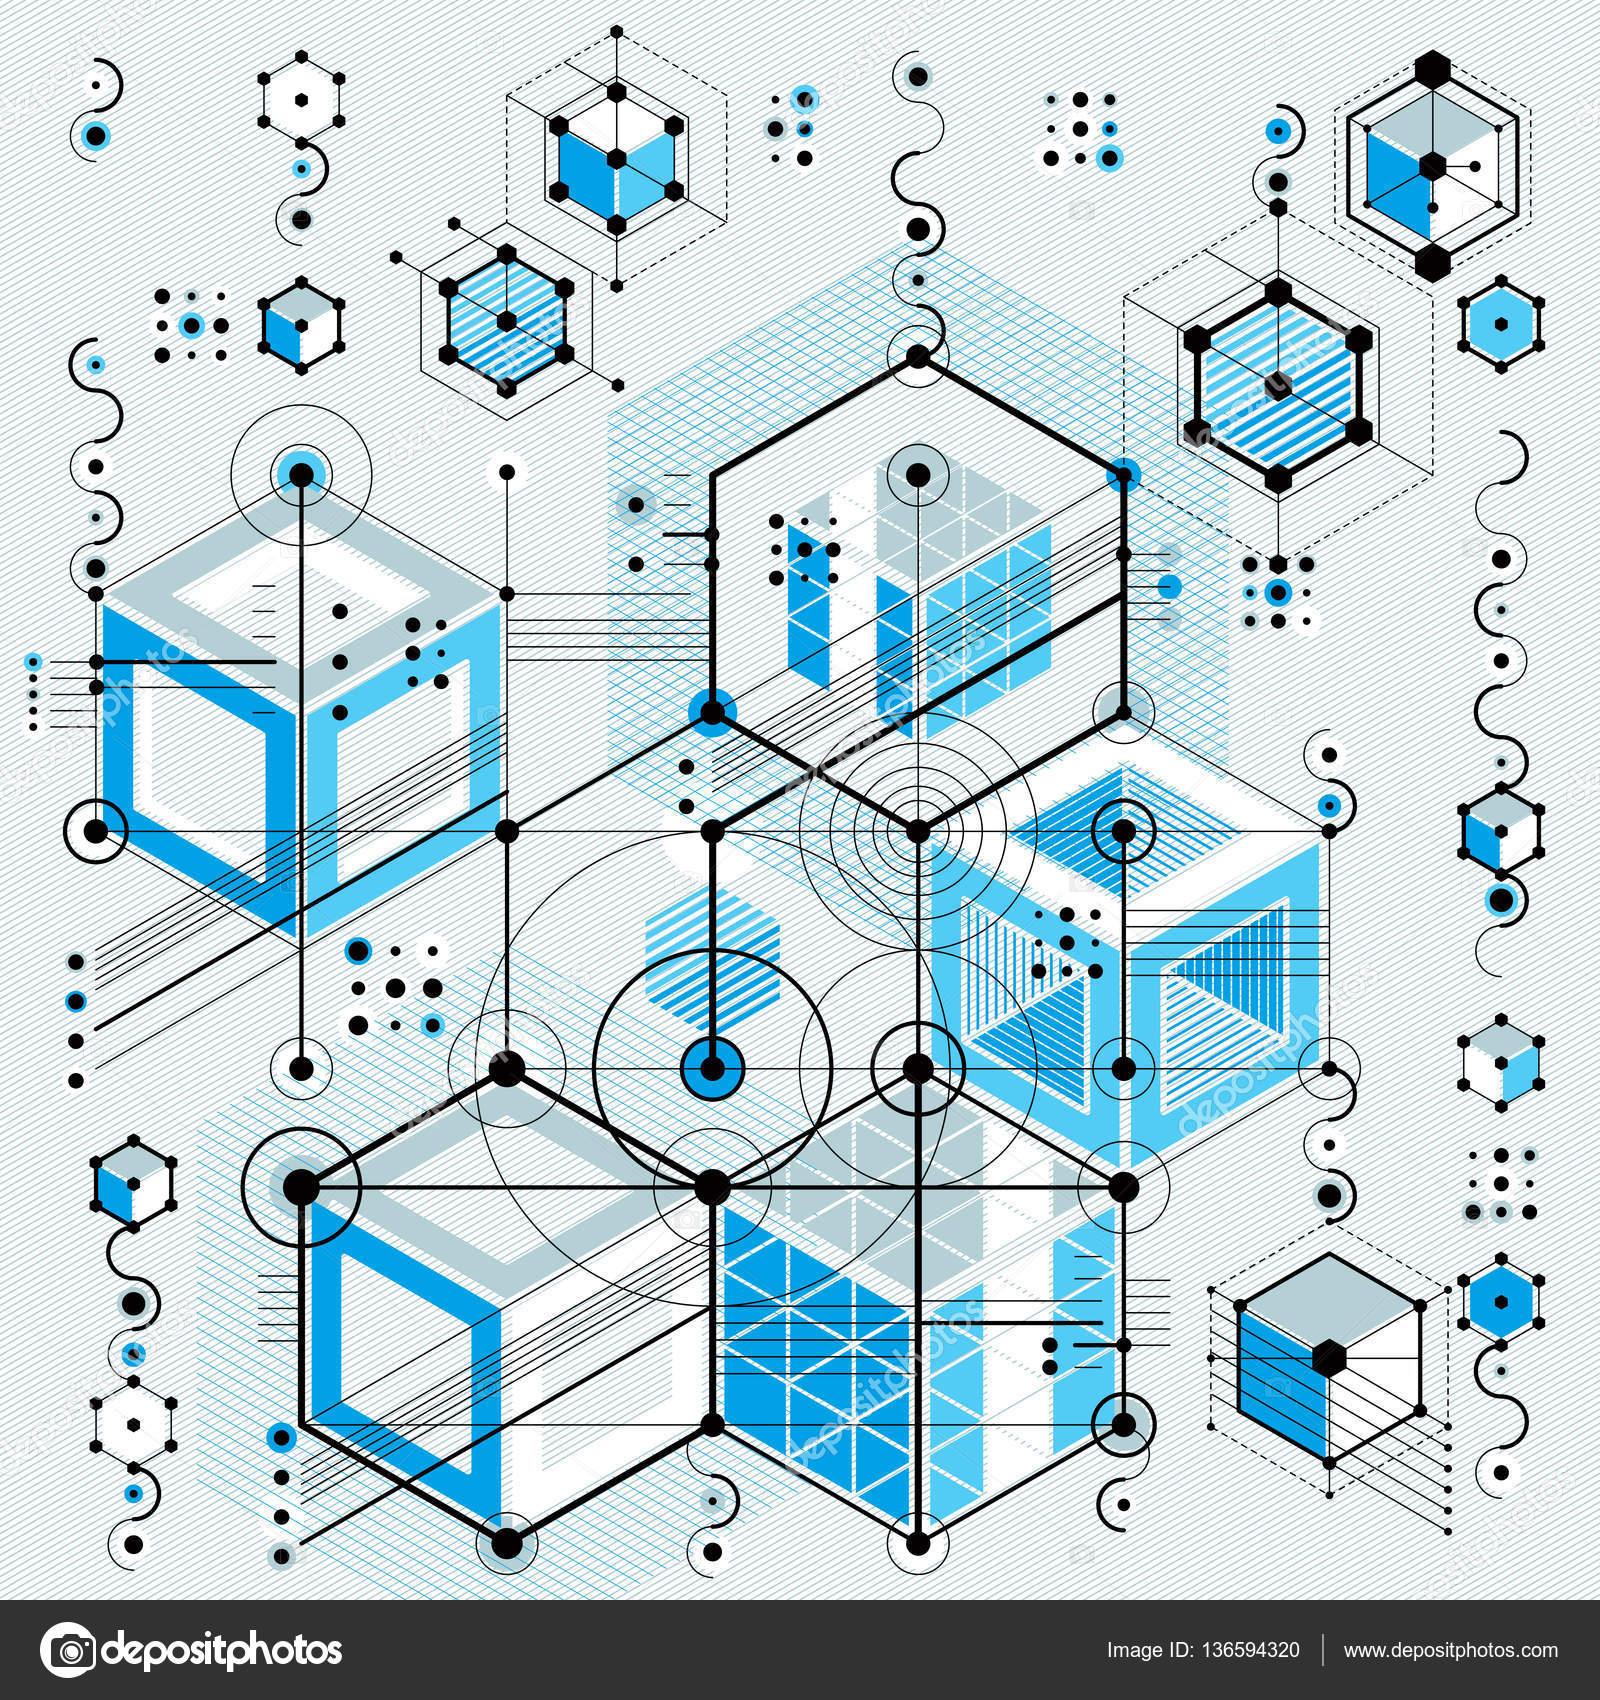 Blueprint con elementos de diseo geomtrico archivo imgenes anteproyecto arquitectnico fondo digital vector con elementos de diseo geomtrico diferente para usar como fondo de pgina web vector de ostapius malvernweather Image collections